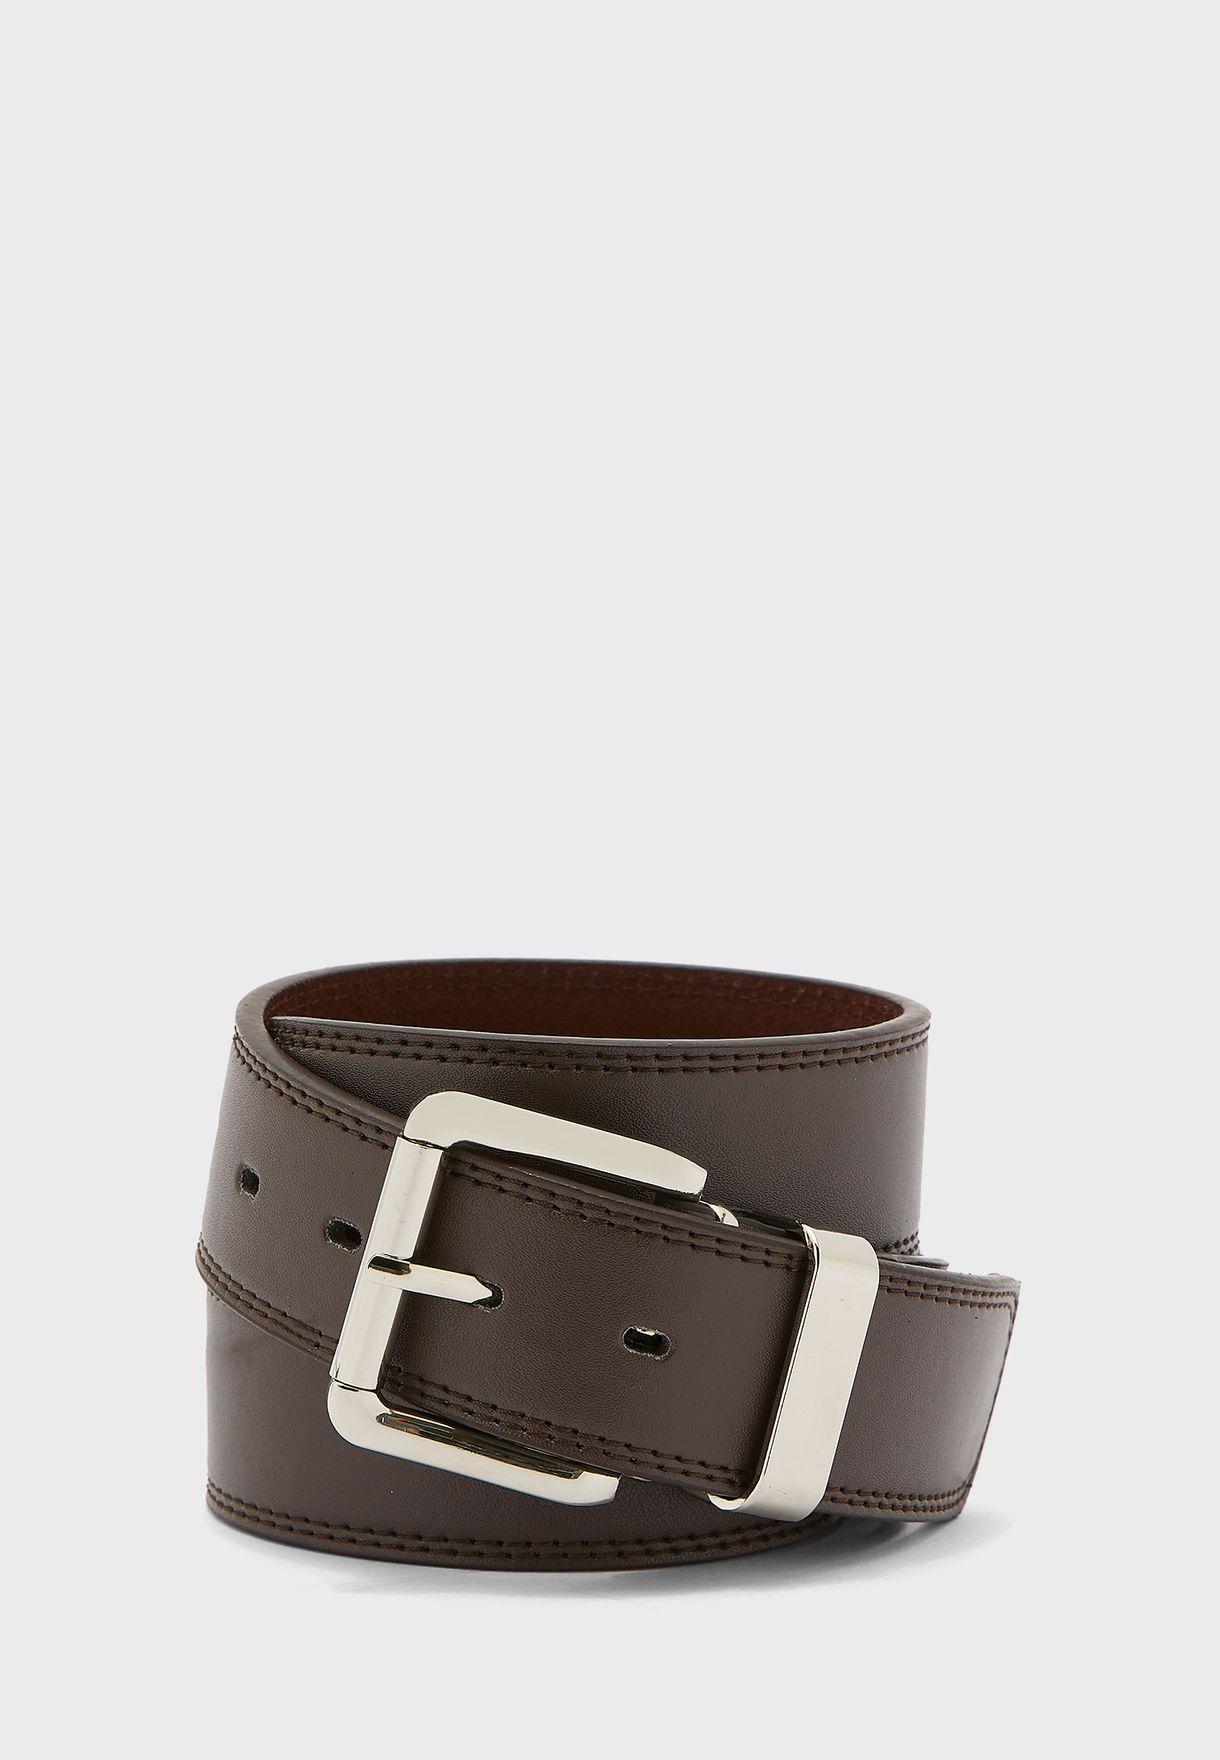 Double Stitched Belt